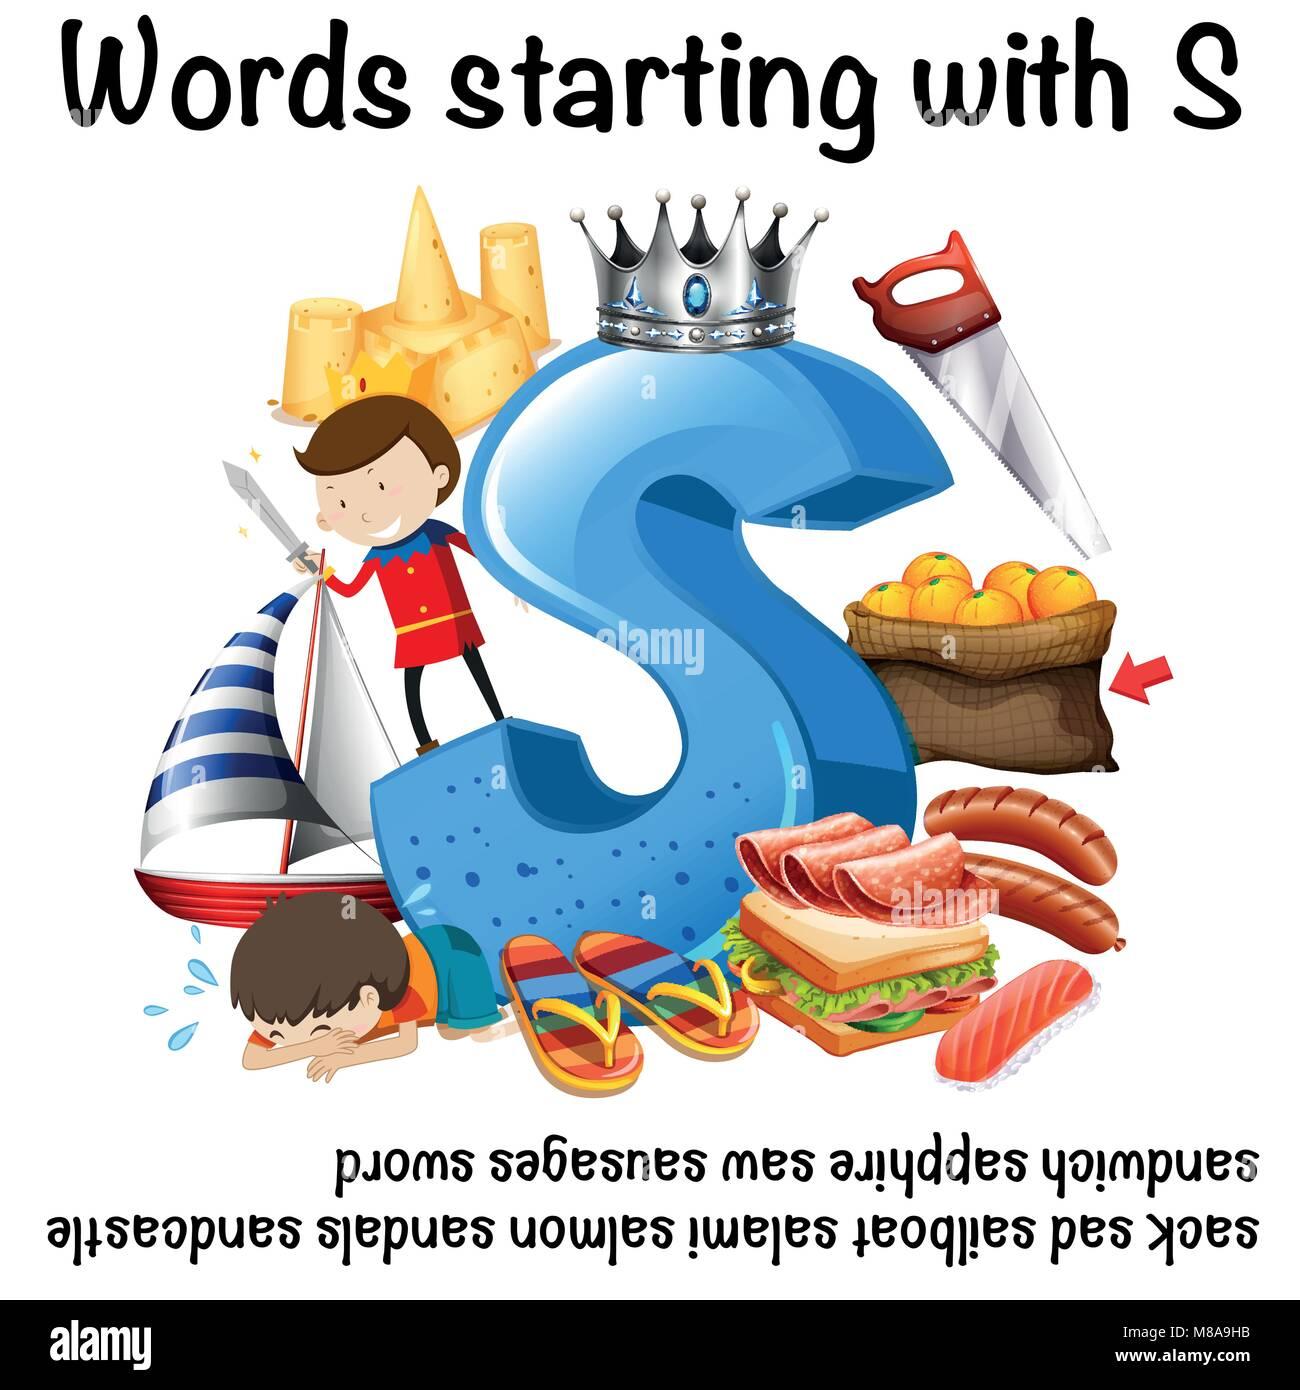 Worksheet design for words starting with S illustration Stock Vector ...